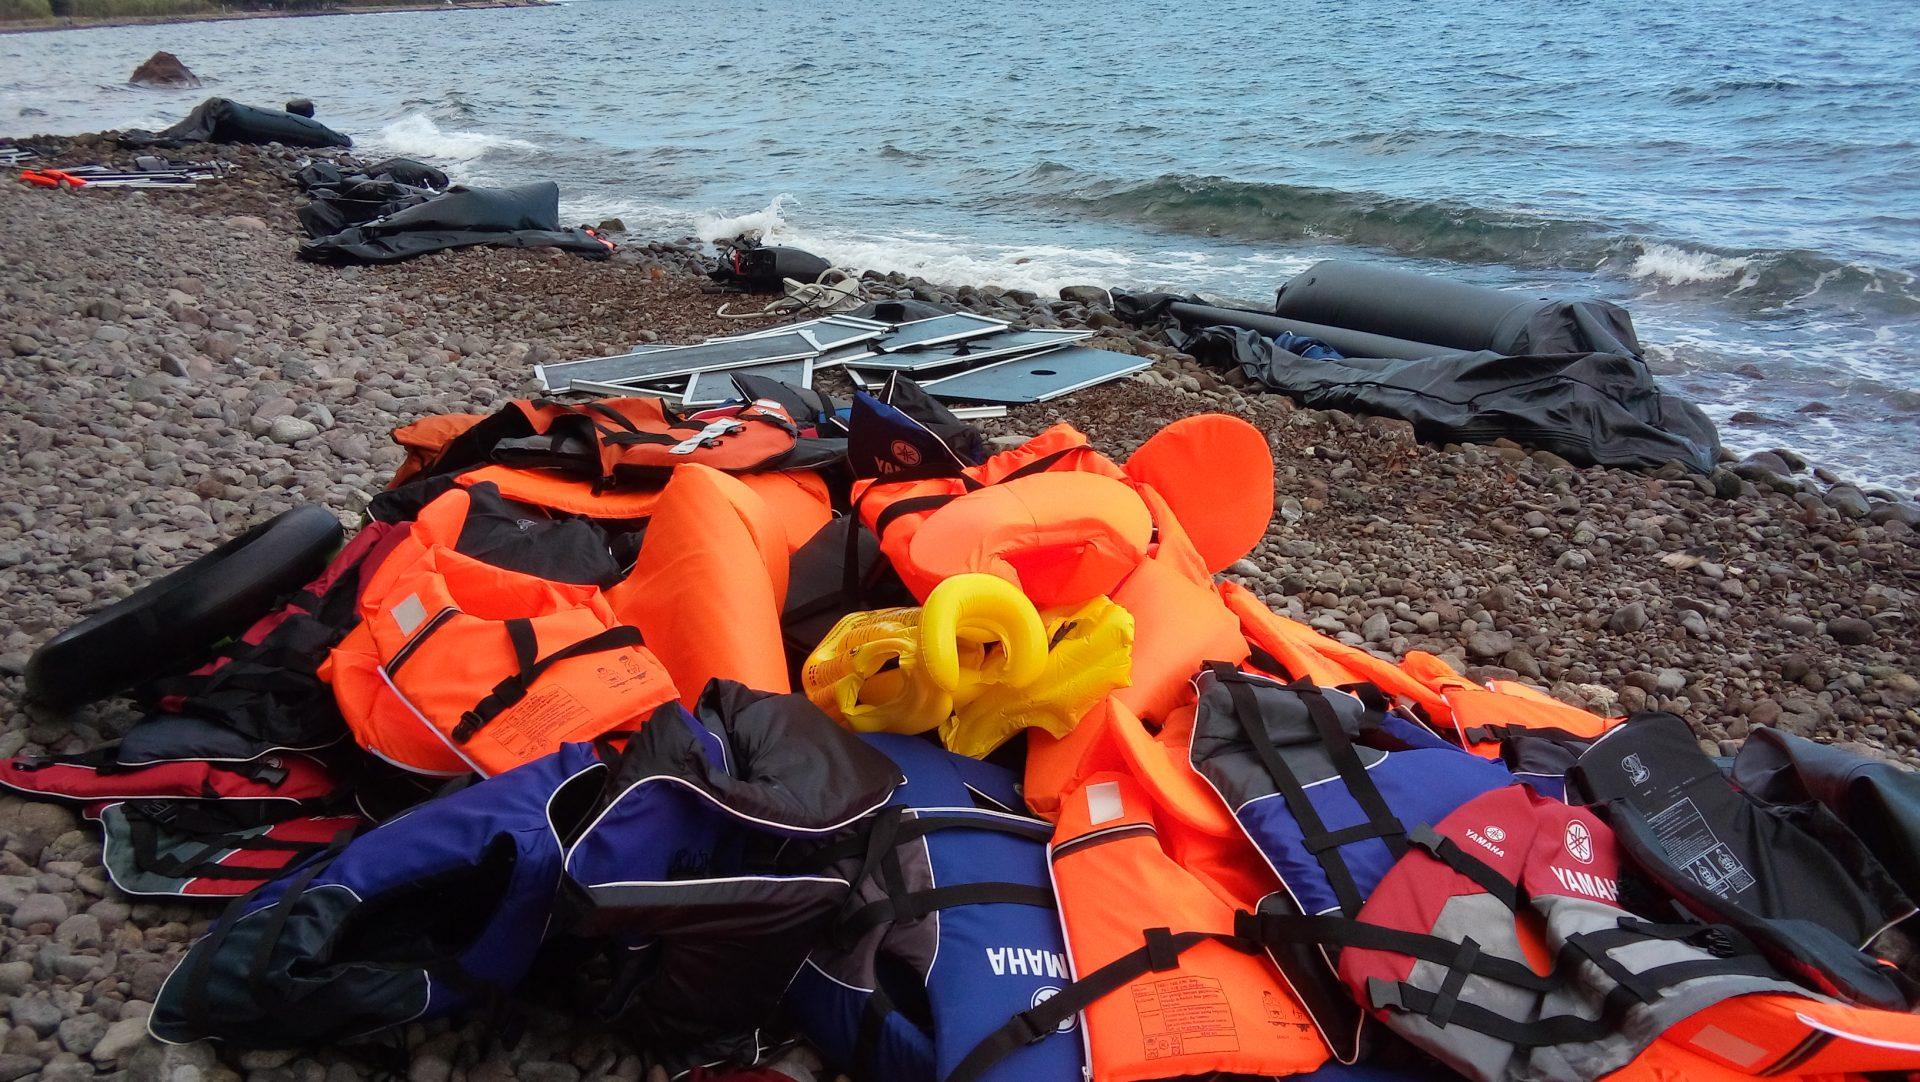 UNHCR saddened at deaths in Aegean Sea shipwreck